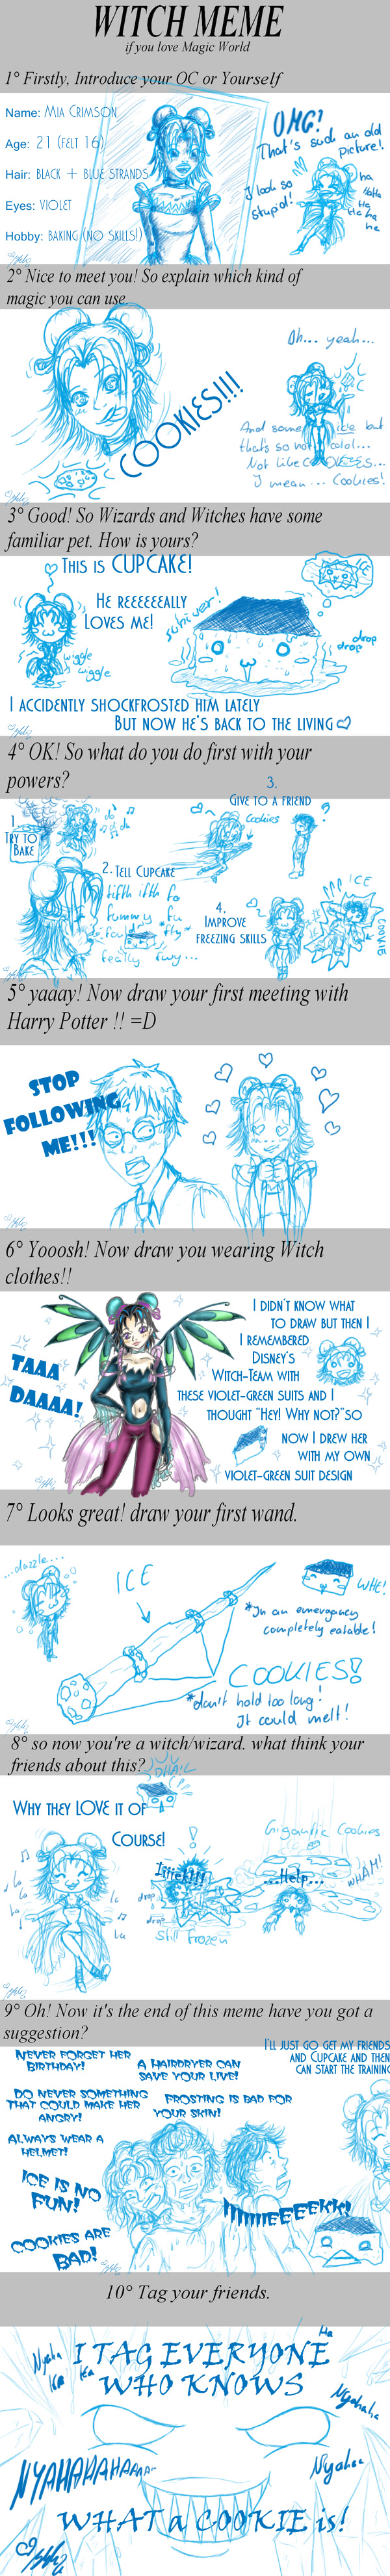 Witch Meme by YummingDoe4